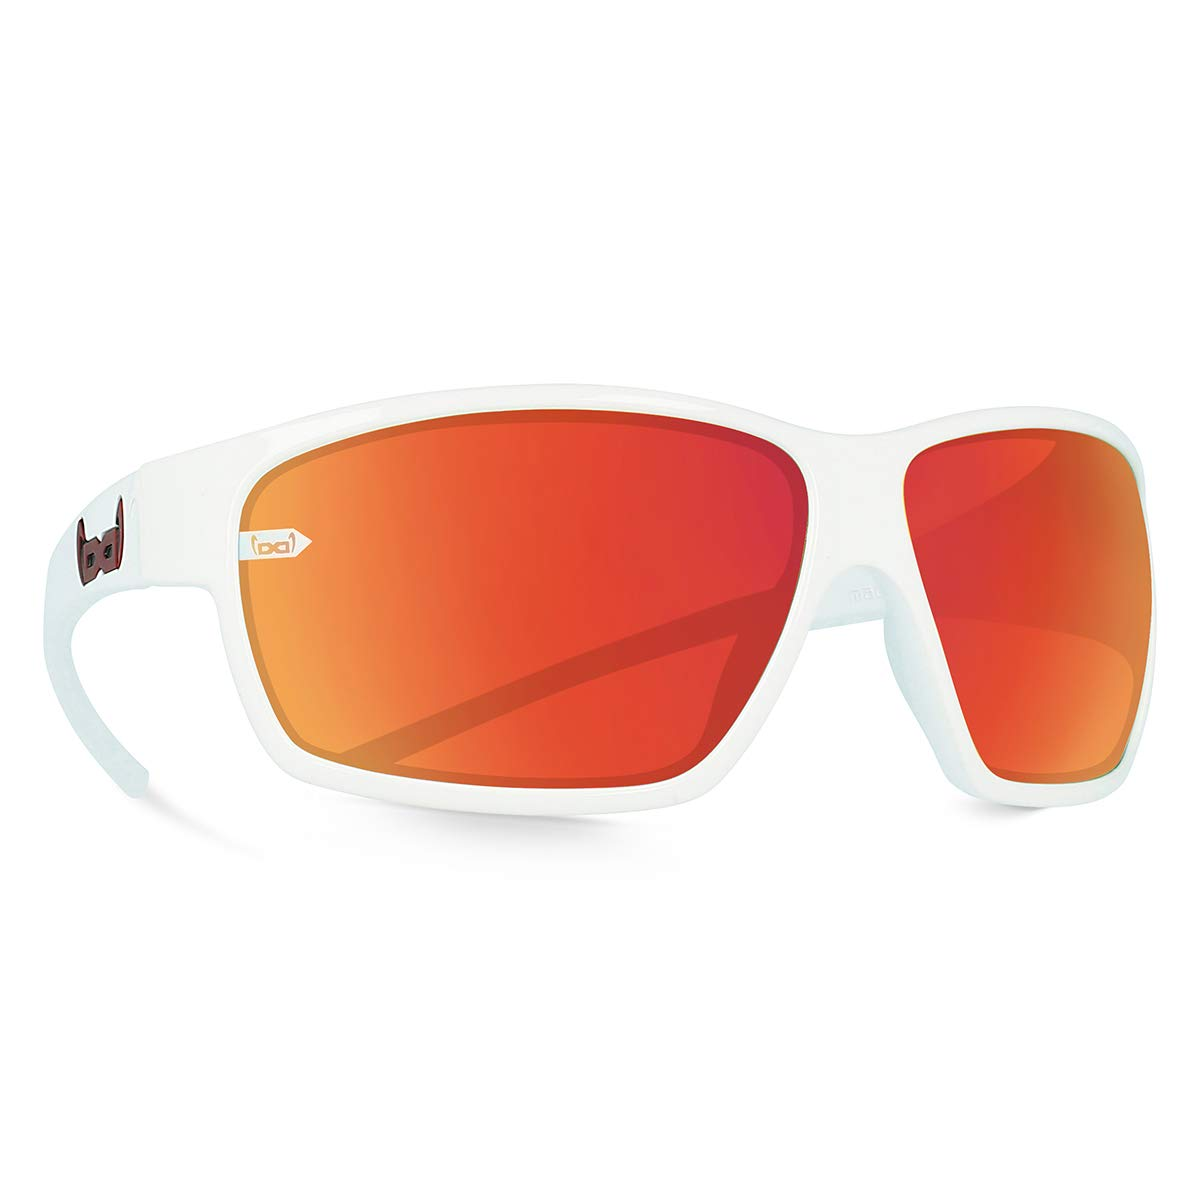 Gloryfy unbreakable eyewear Uni G15 Sonnenbrille, Weiß, Uni eyewear 479a50